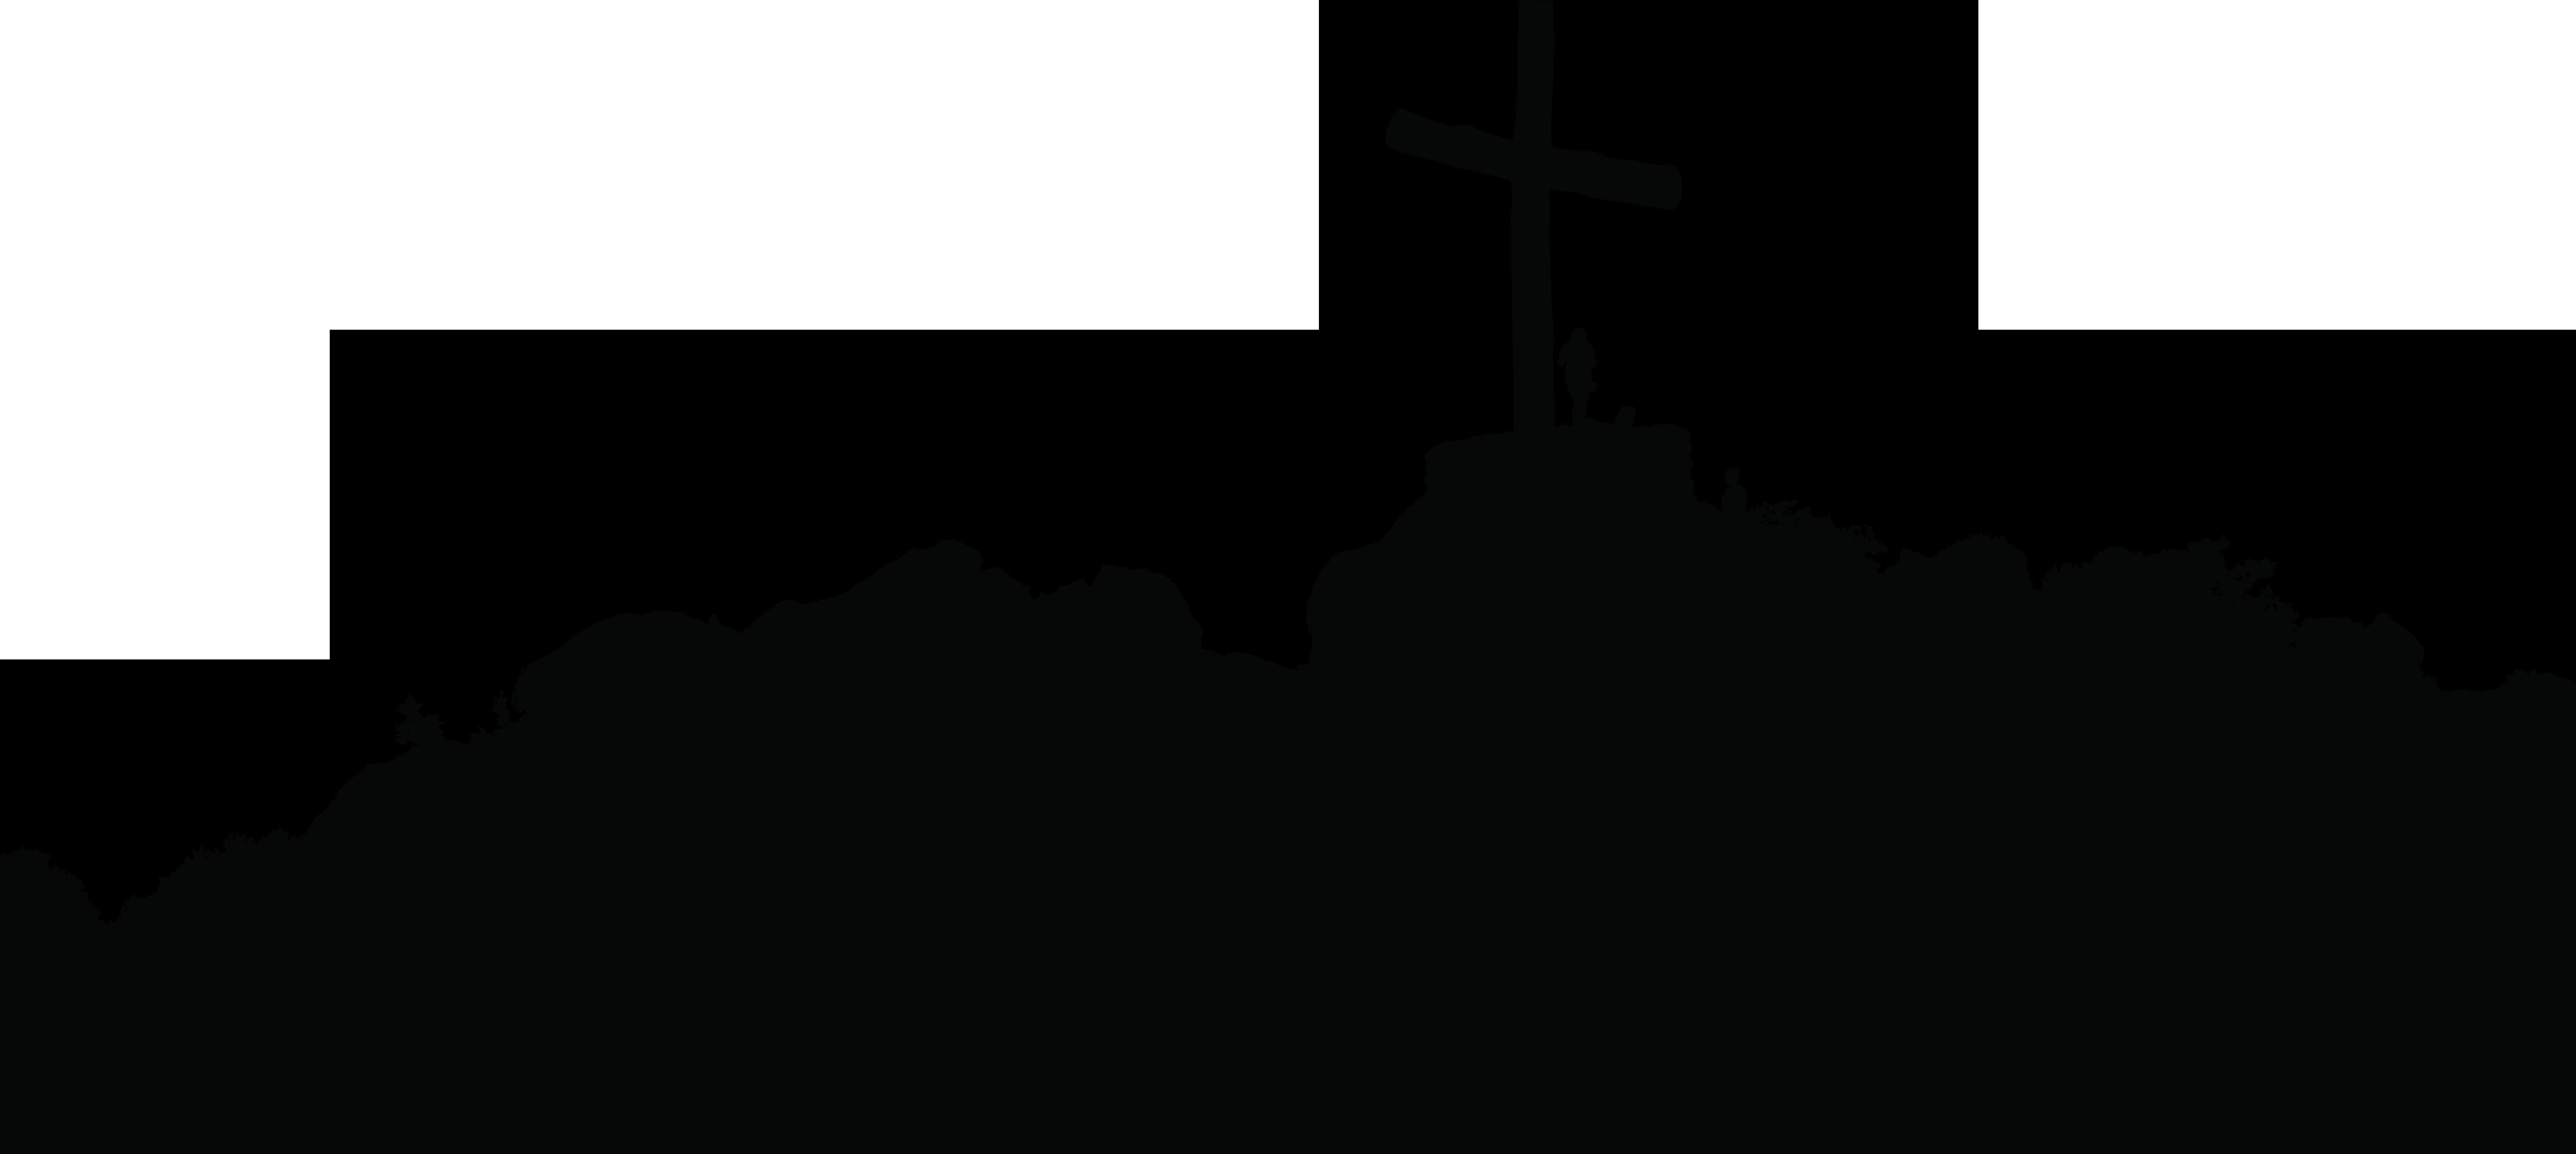 Christian cross clip art. Hill clipart silhouette